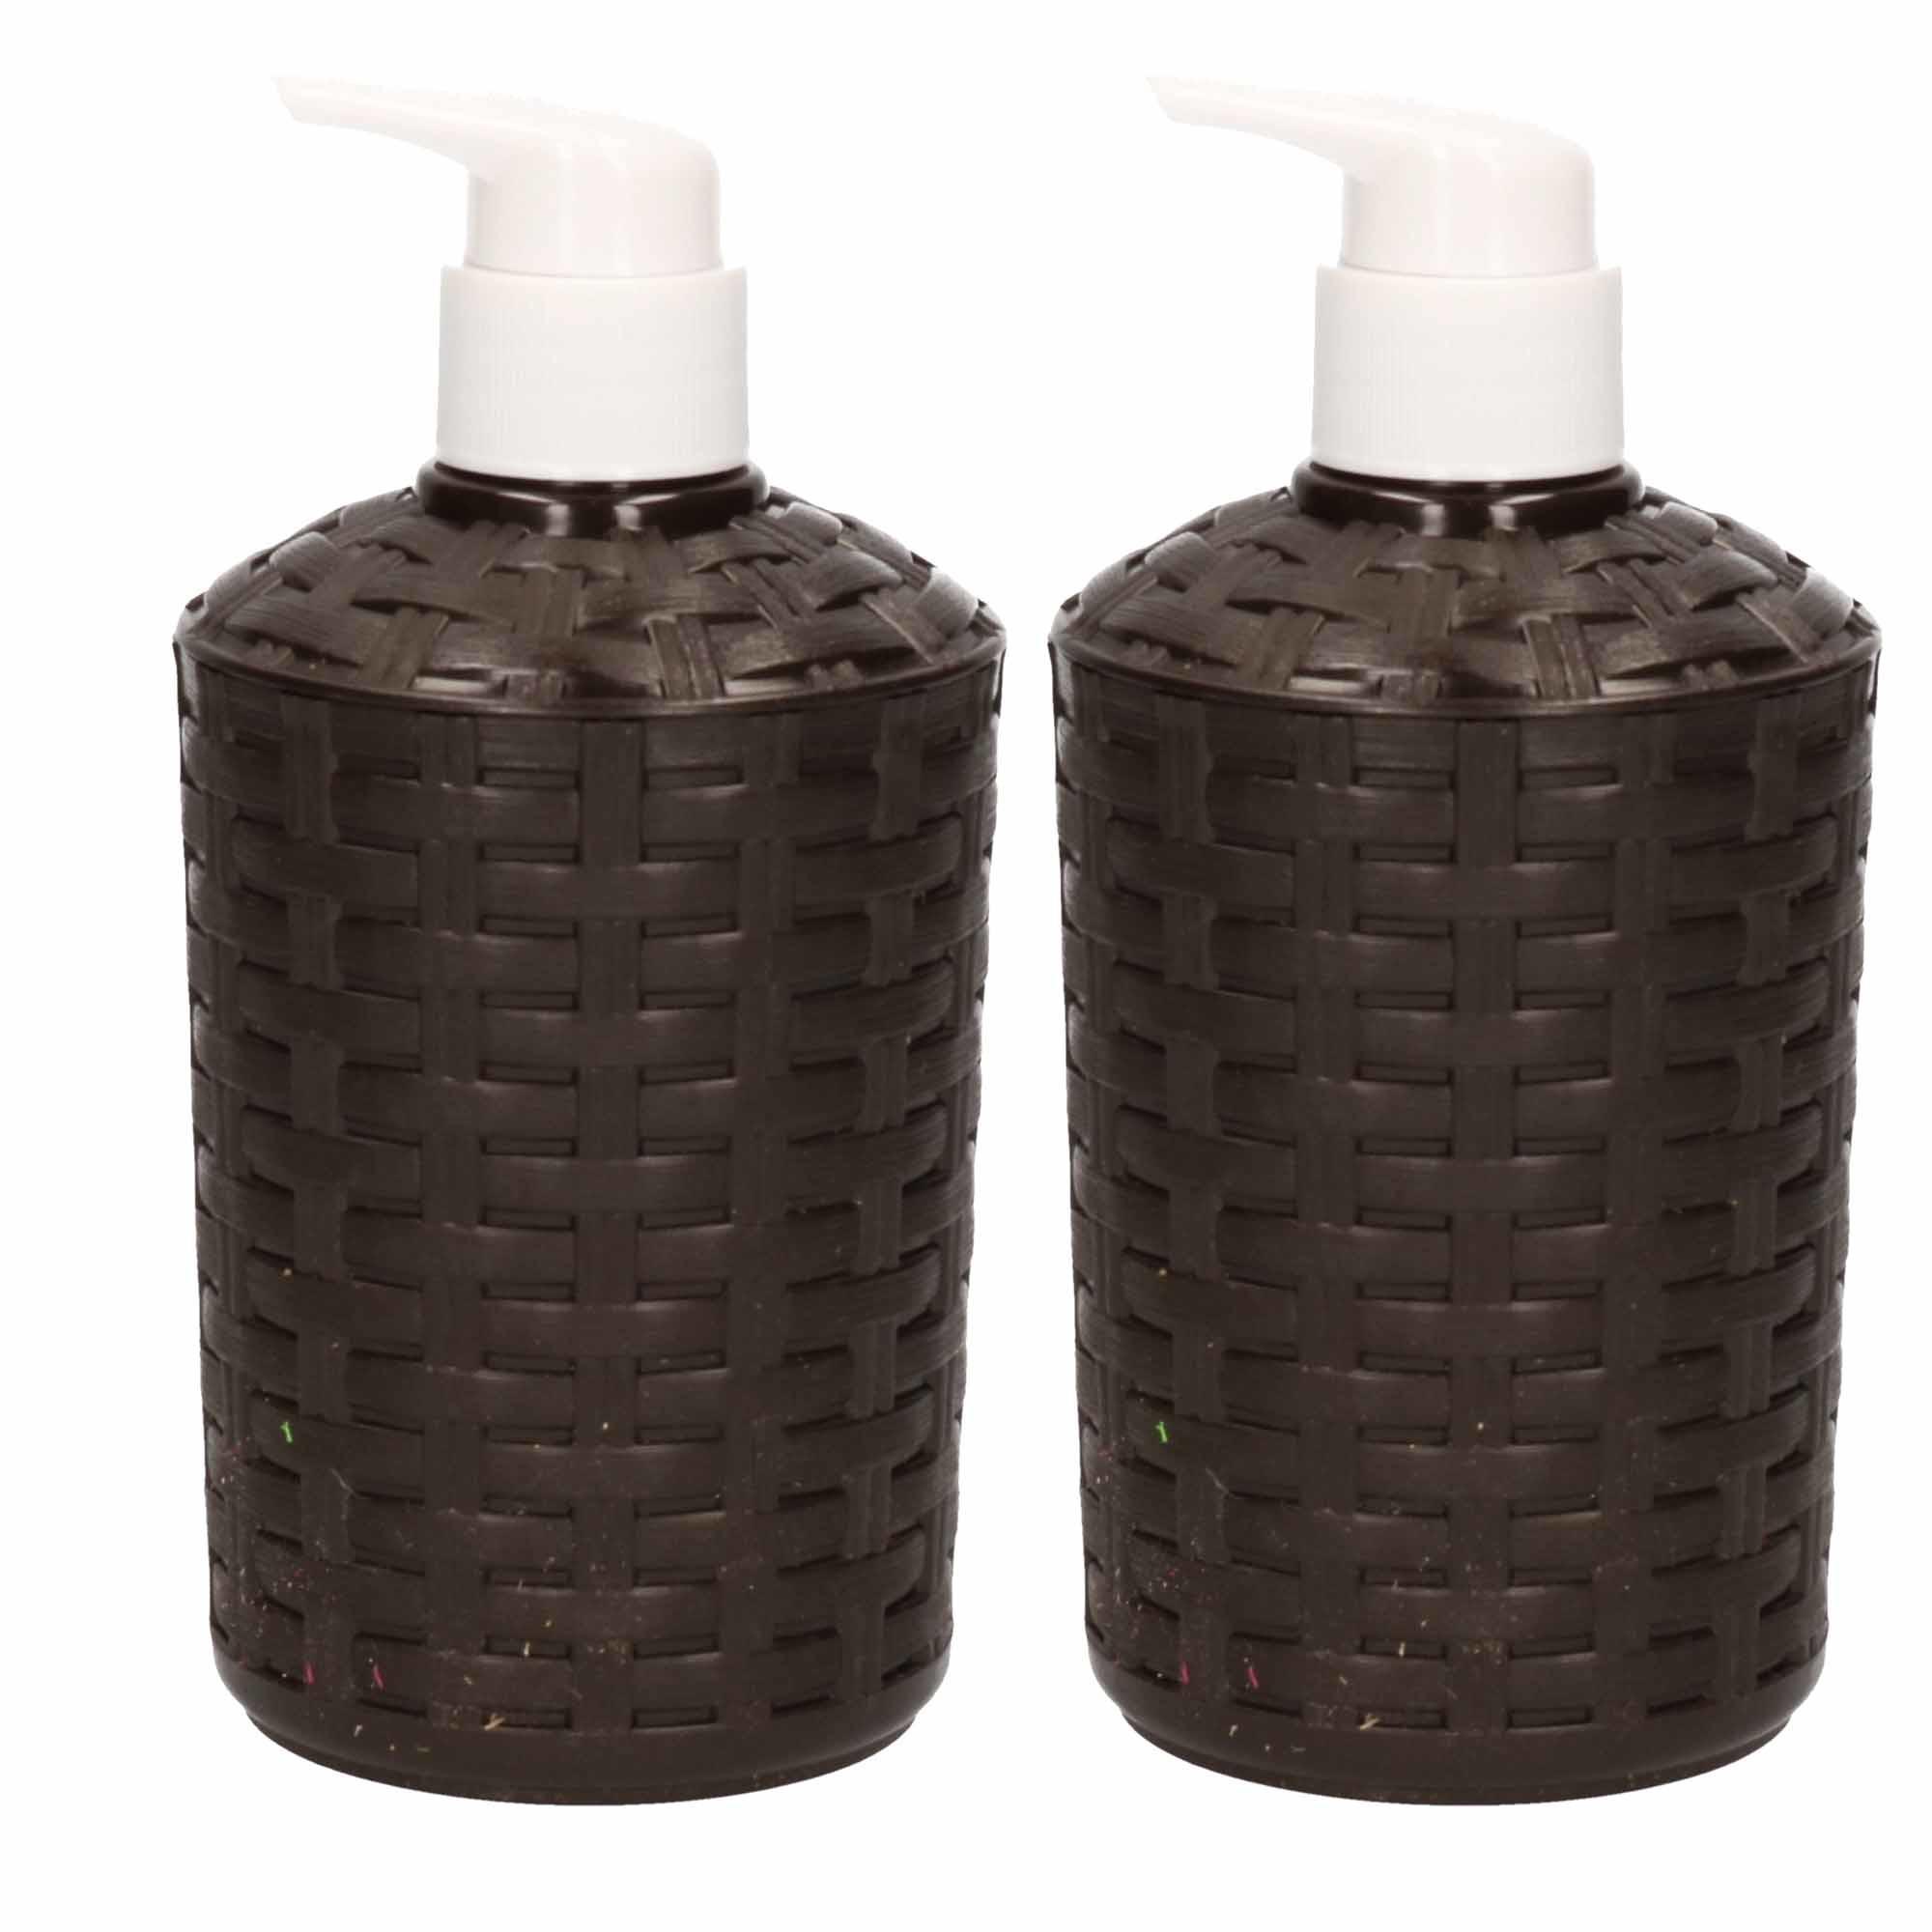 5x Zeep pompjes-dispensers zwart geweven 16 cm